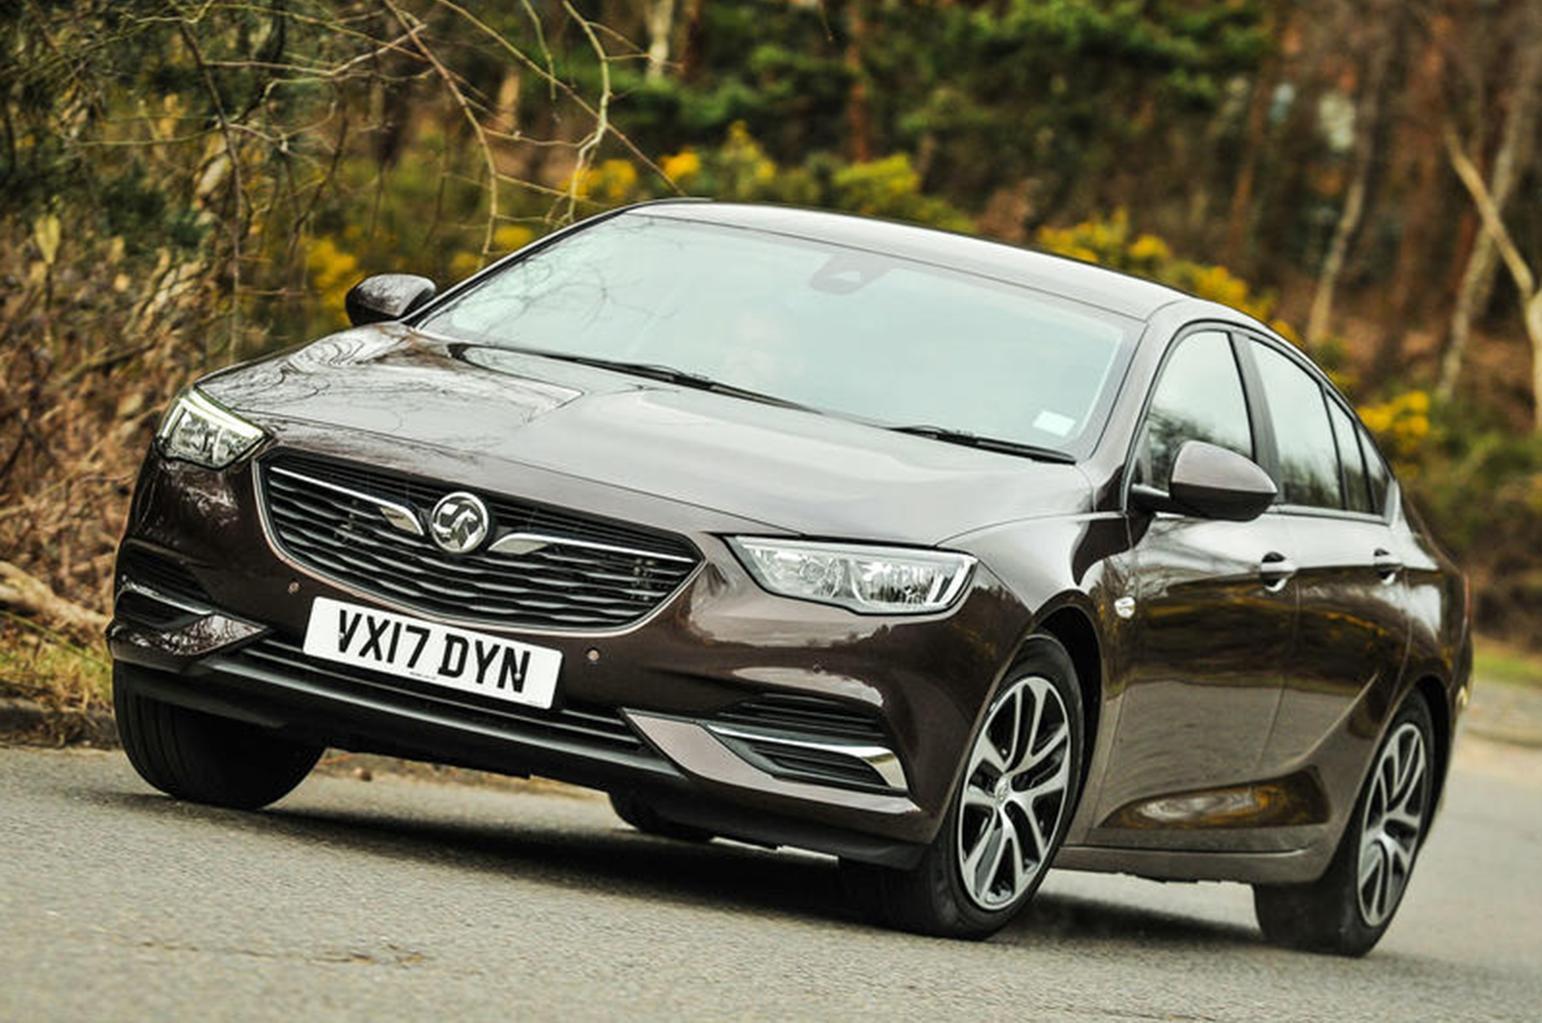 7: Vauxhall Insignia Grand Sport 1.6